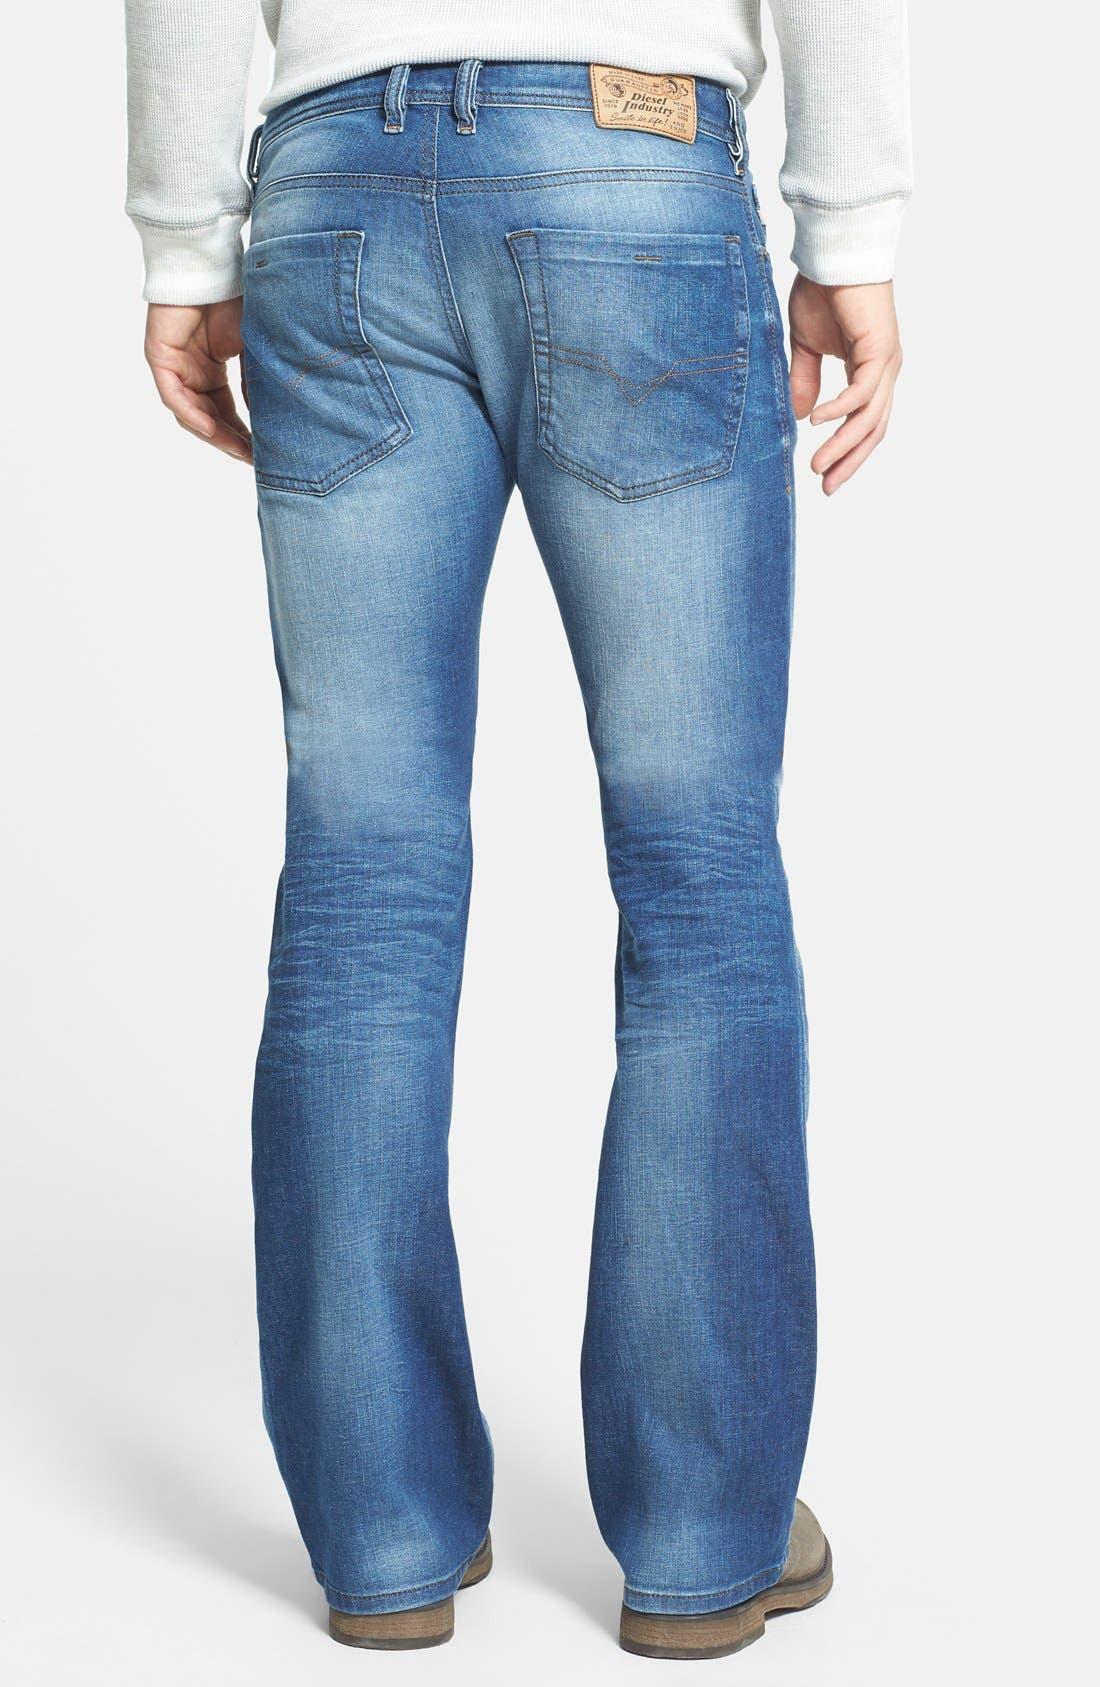 Zathan Bootcut Jeans,                             Alternate thumbnail 3, color,                             499